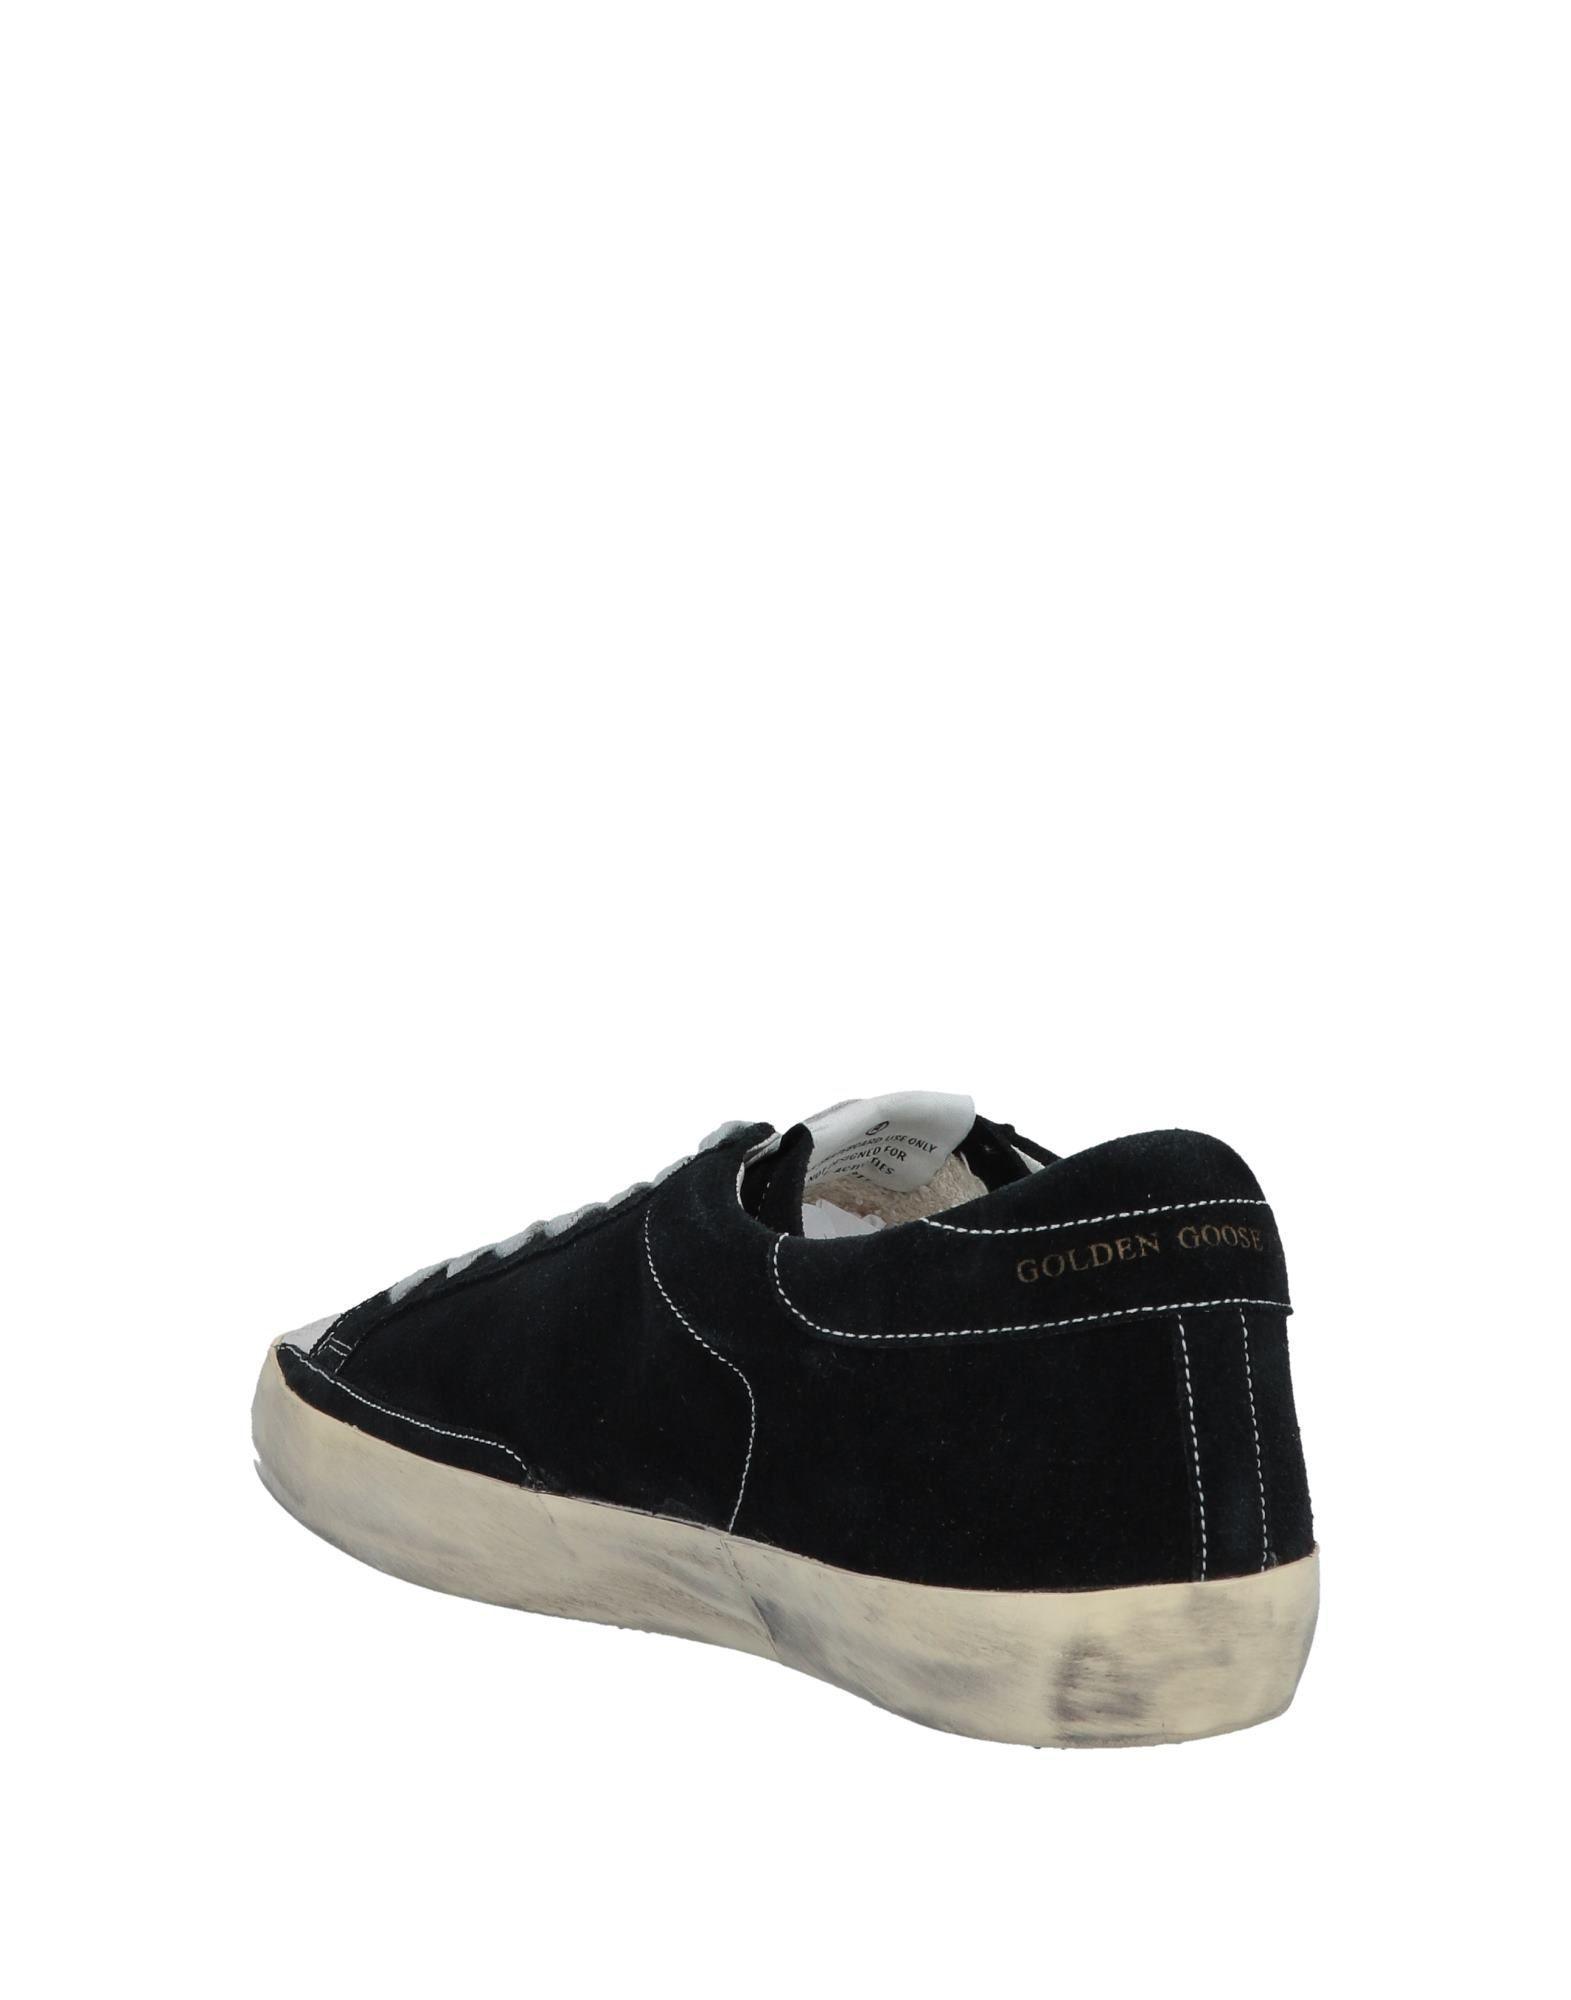 Sneakers & Deportivas Golden Goose Deluxe Brand de Ante de color Negro para hombre